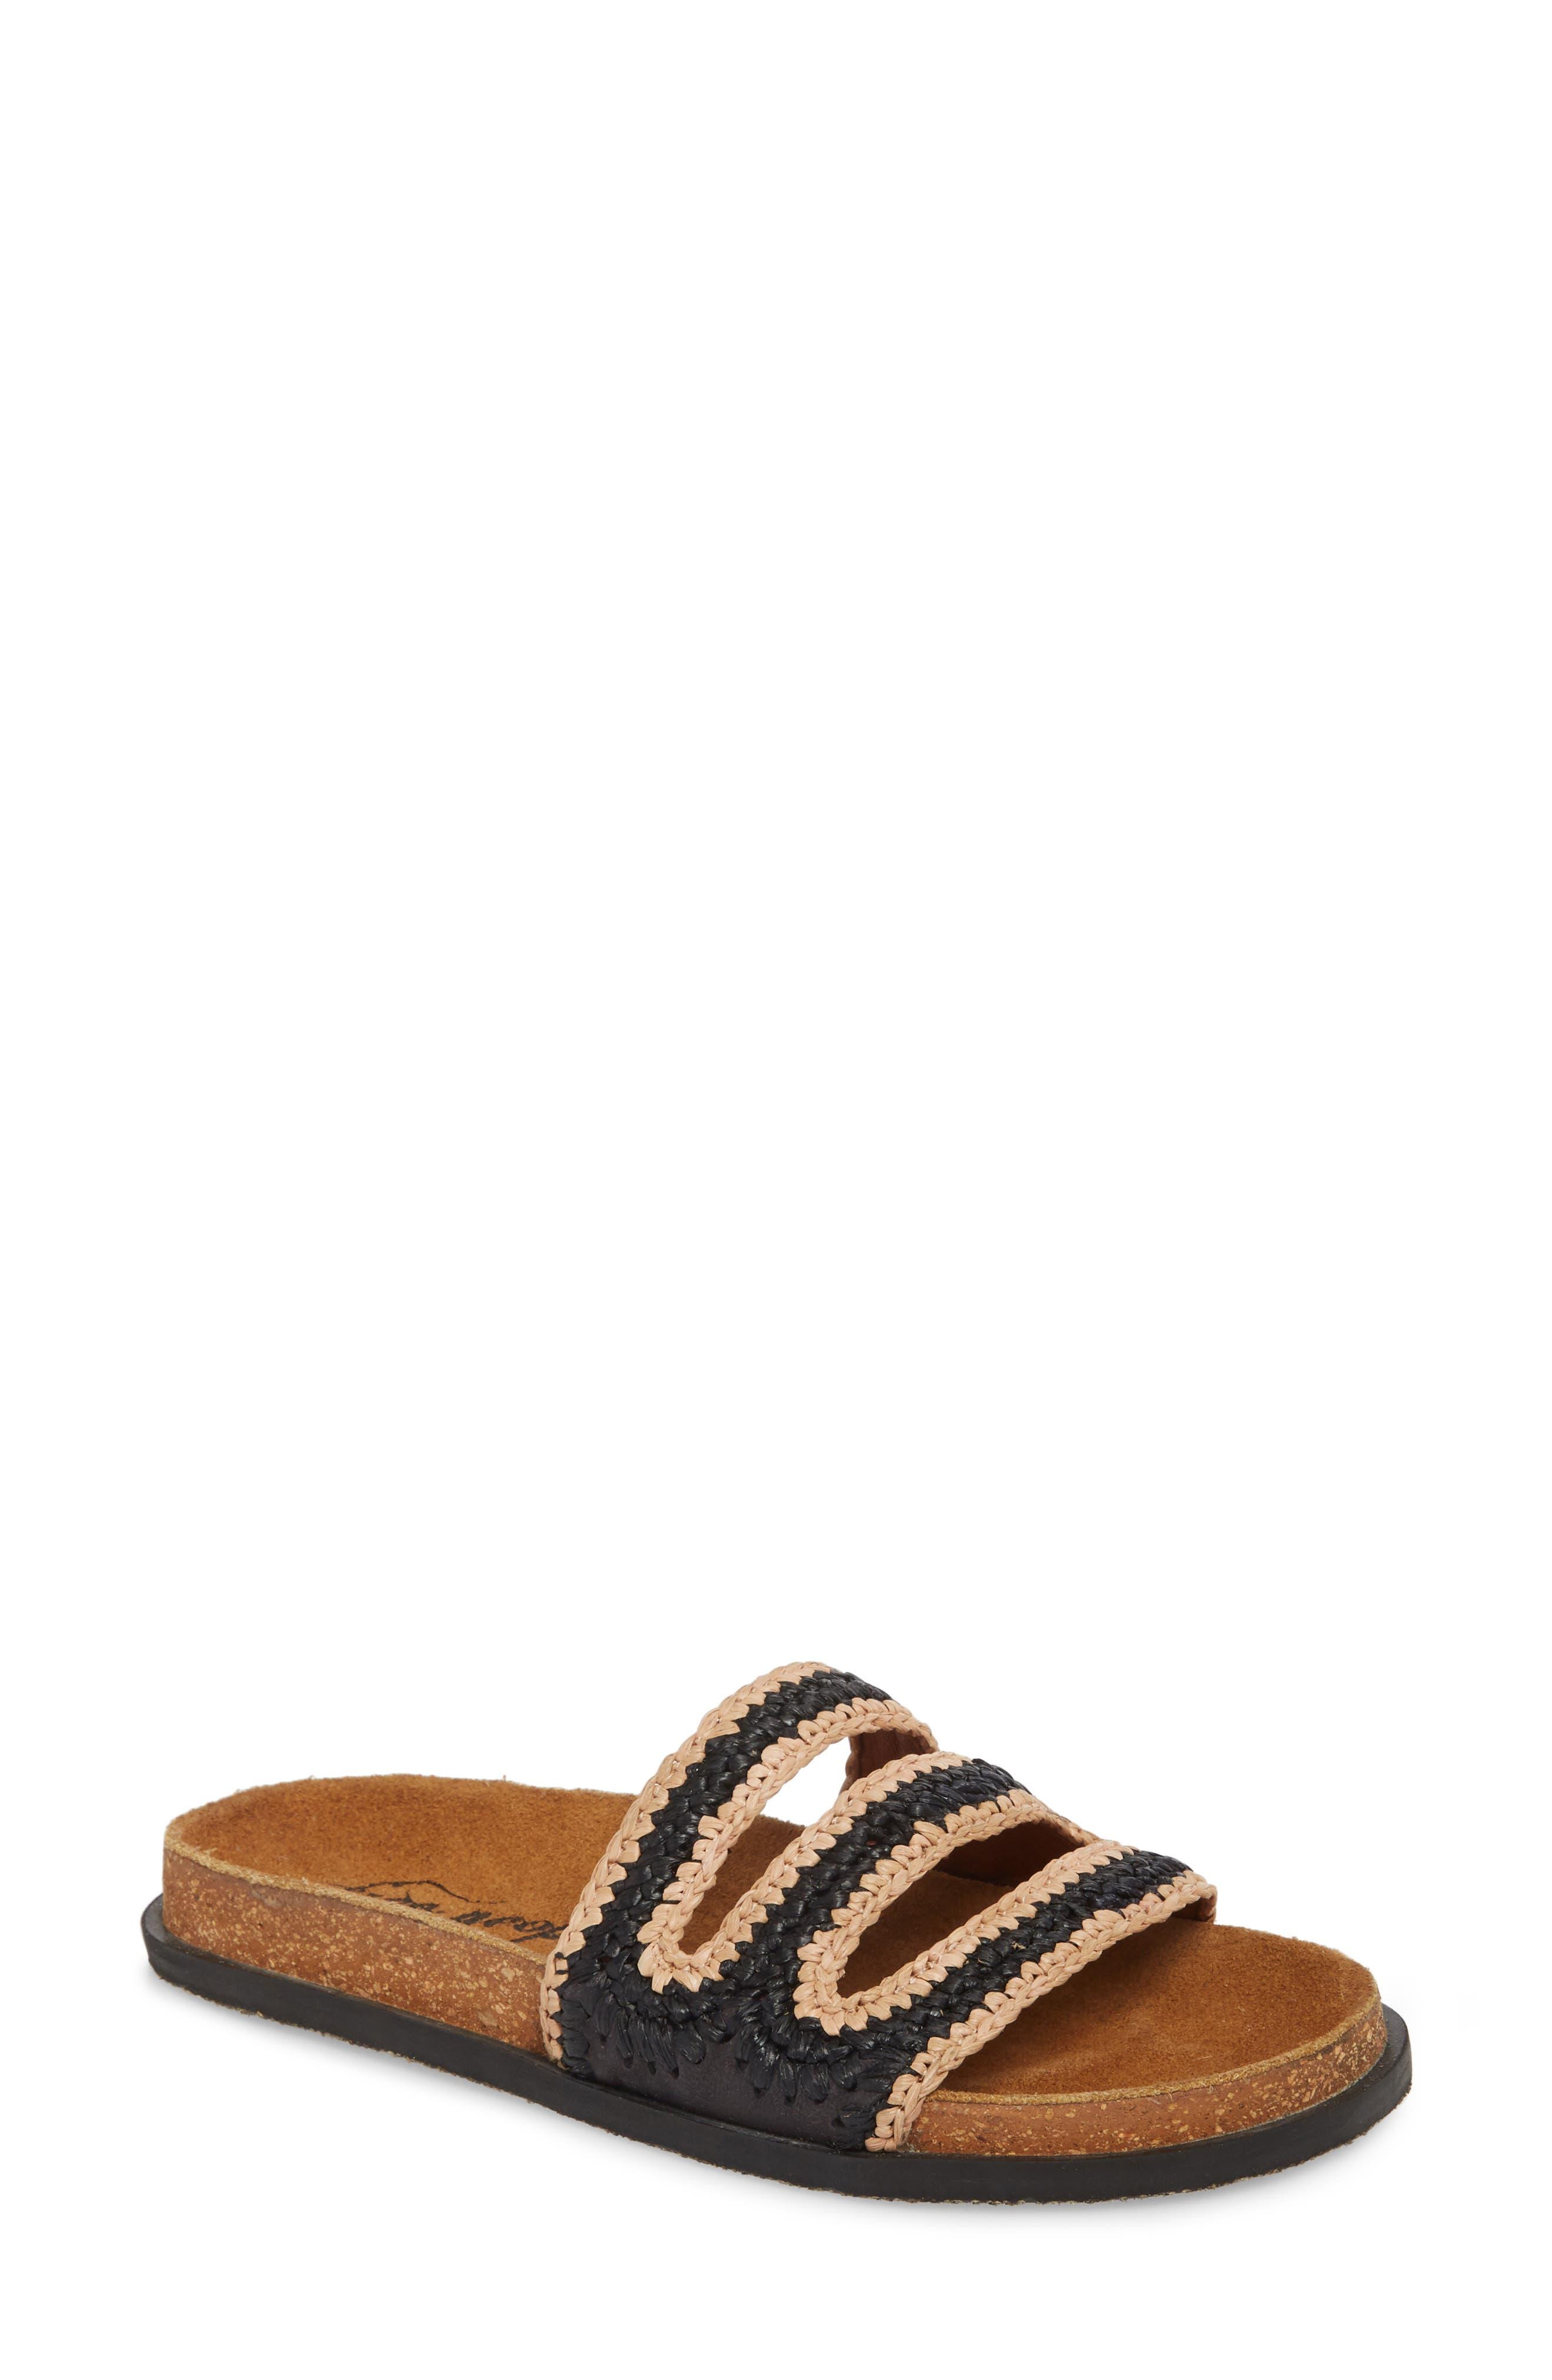 Crete Slide Sandal,                         Main,                         color,